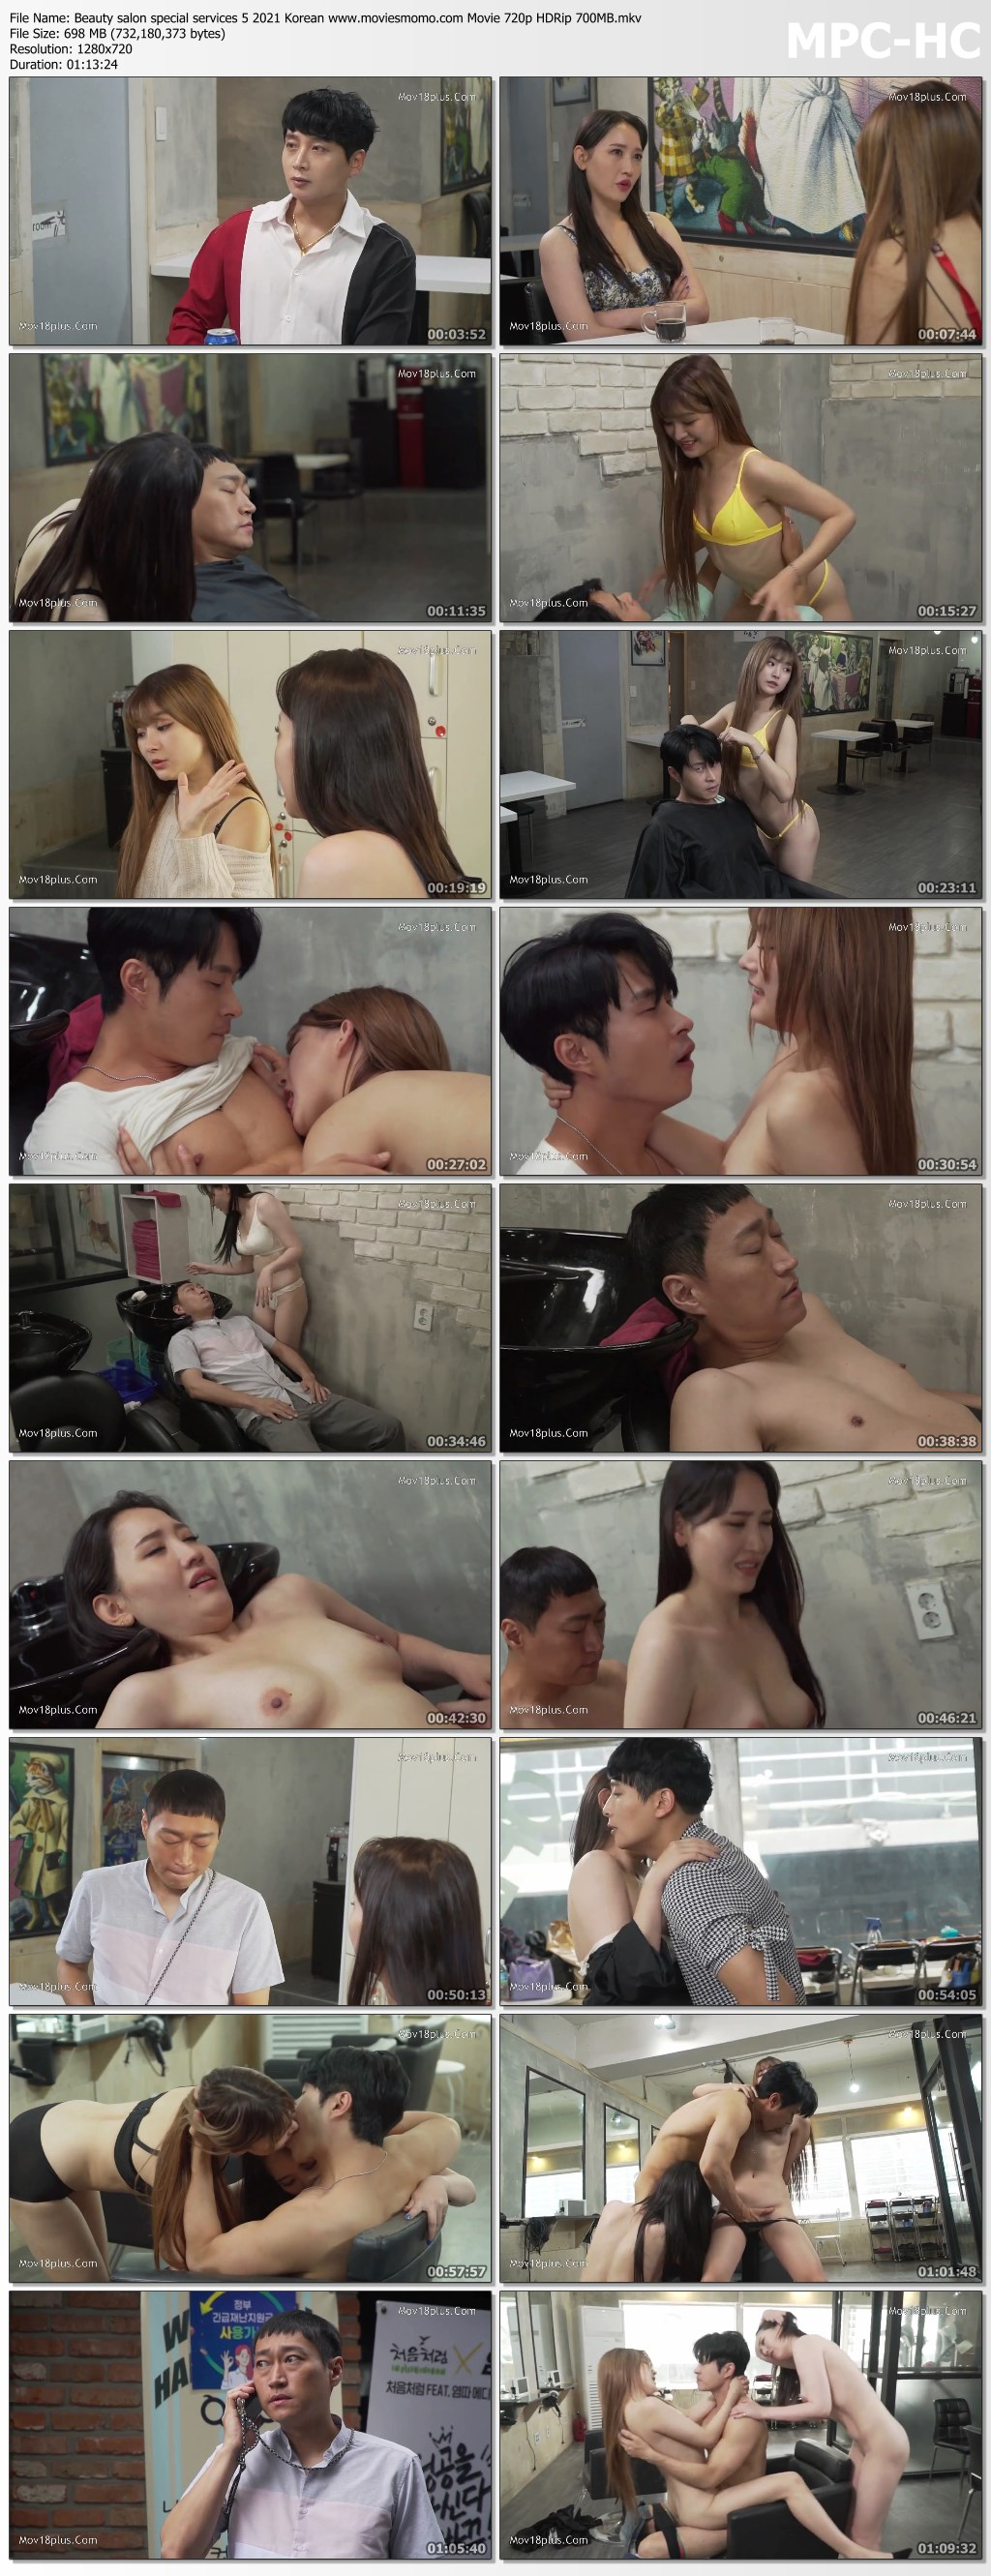 Beauty salon special services 5 2021 Korean www.moviesmomo.com Movie 720p HDRip 700MB.mkv thumbs - 18+ Beauty salon special services 5 2021 Korean Movie 720p HDRip 700MB x264 AAC